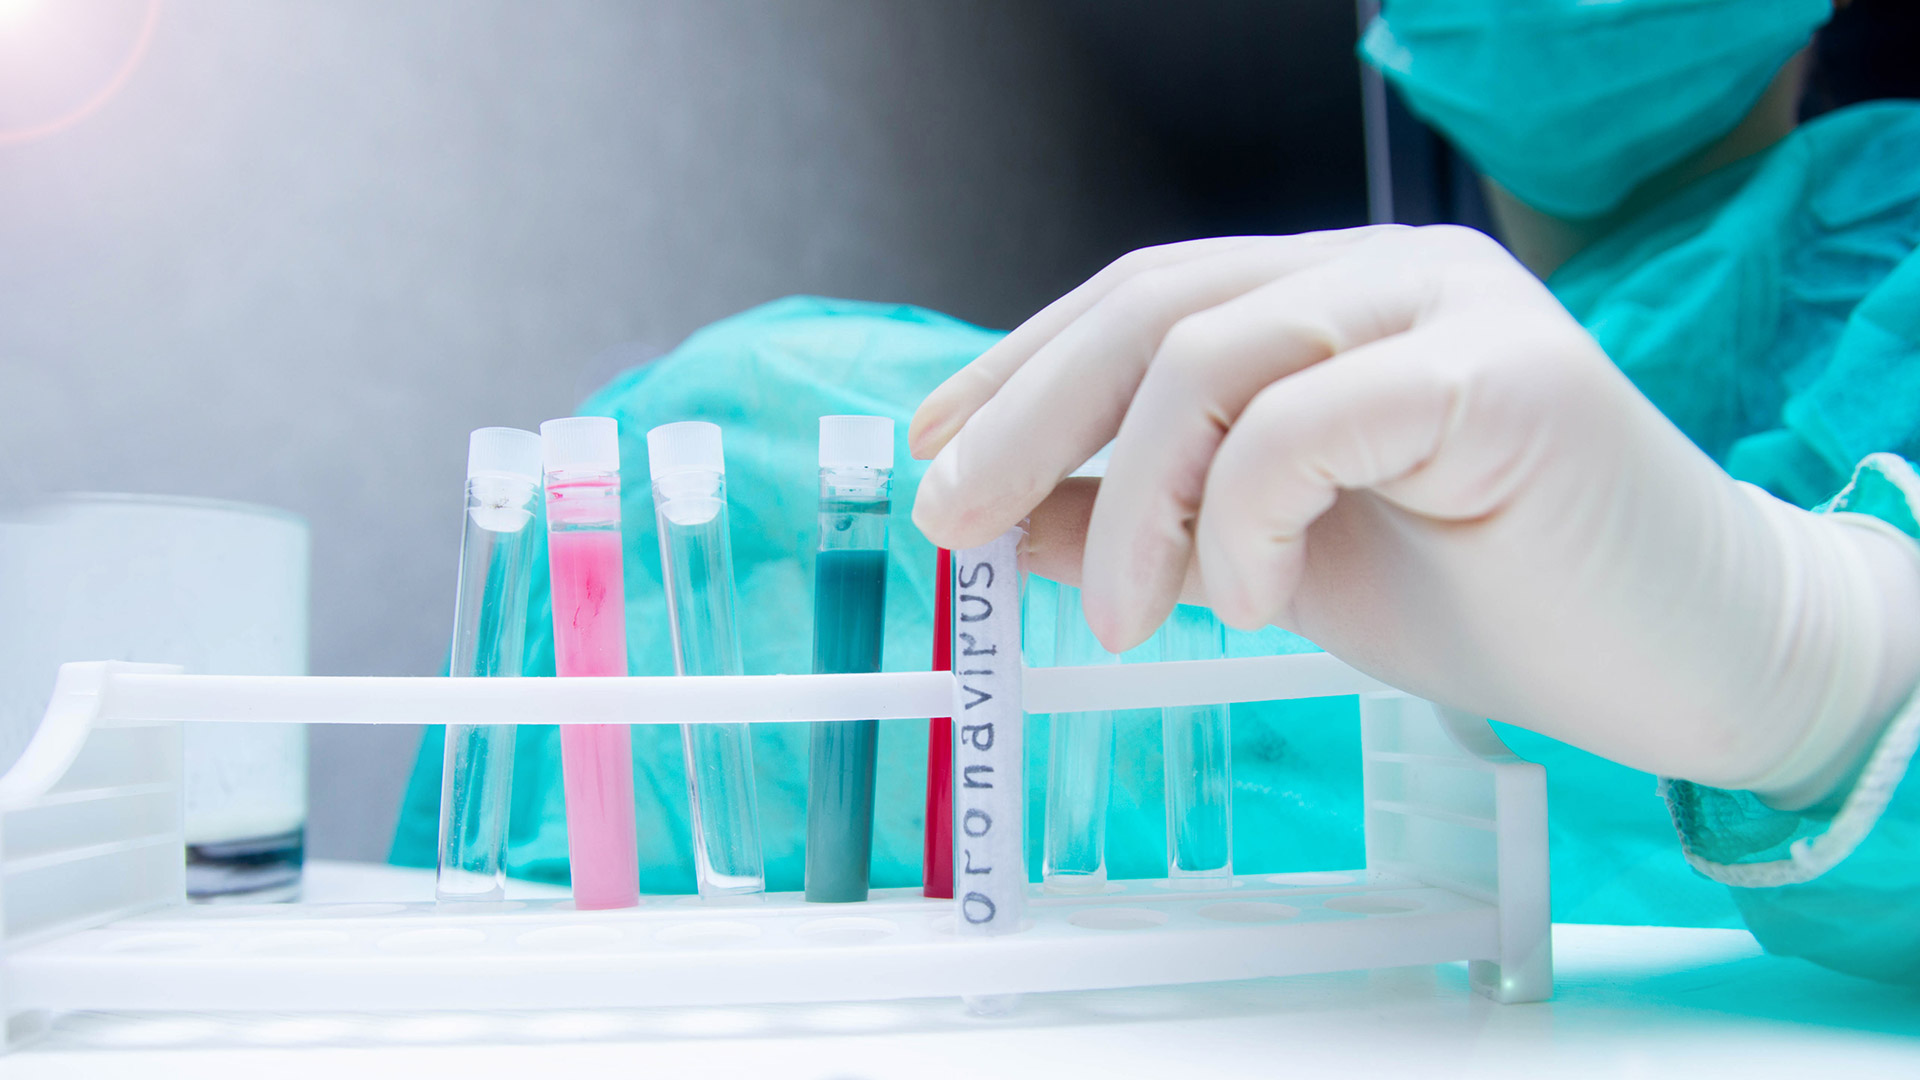 Coronavirus, a global pandemic